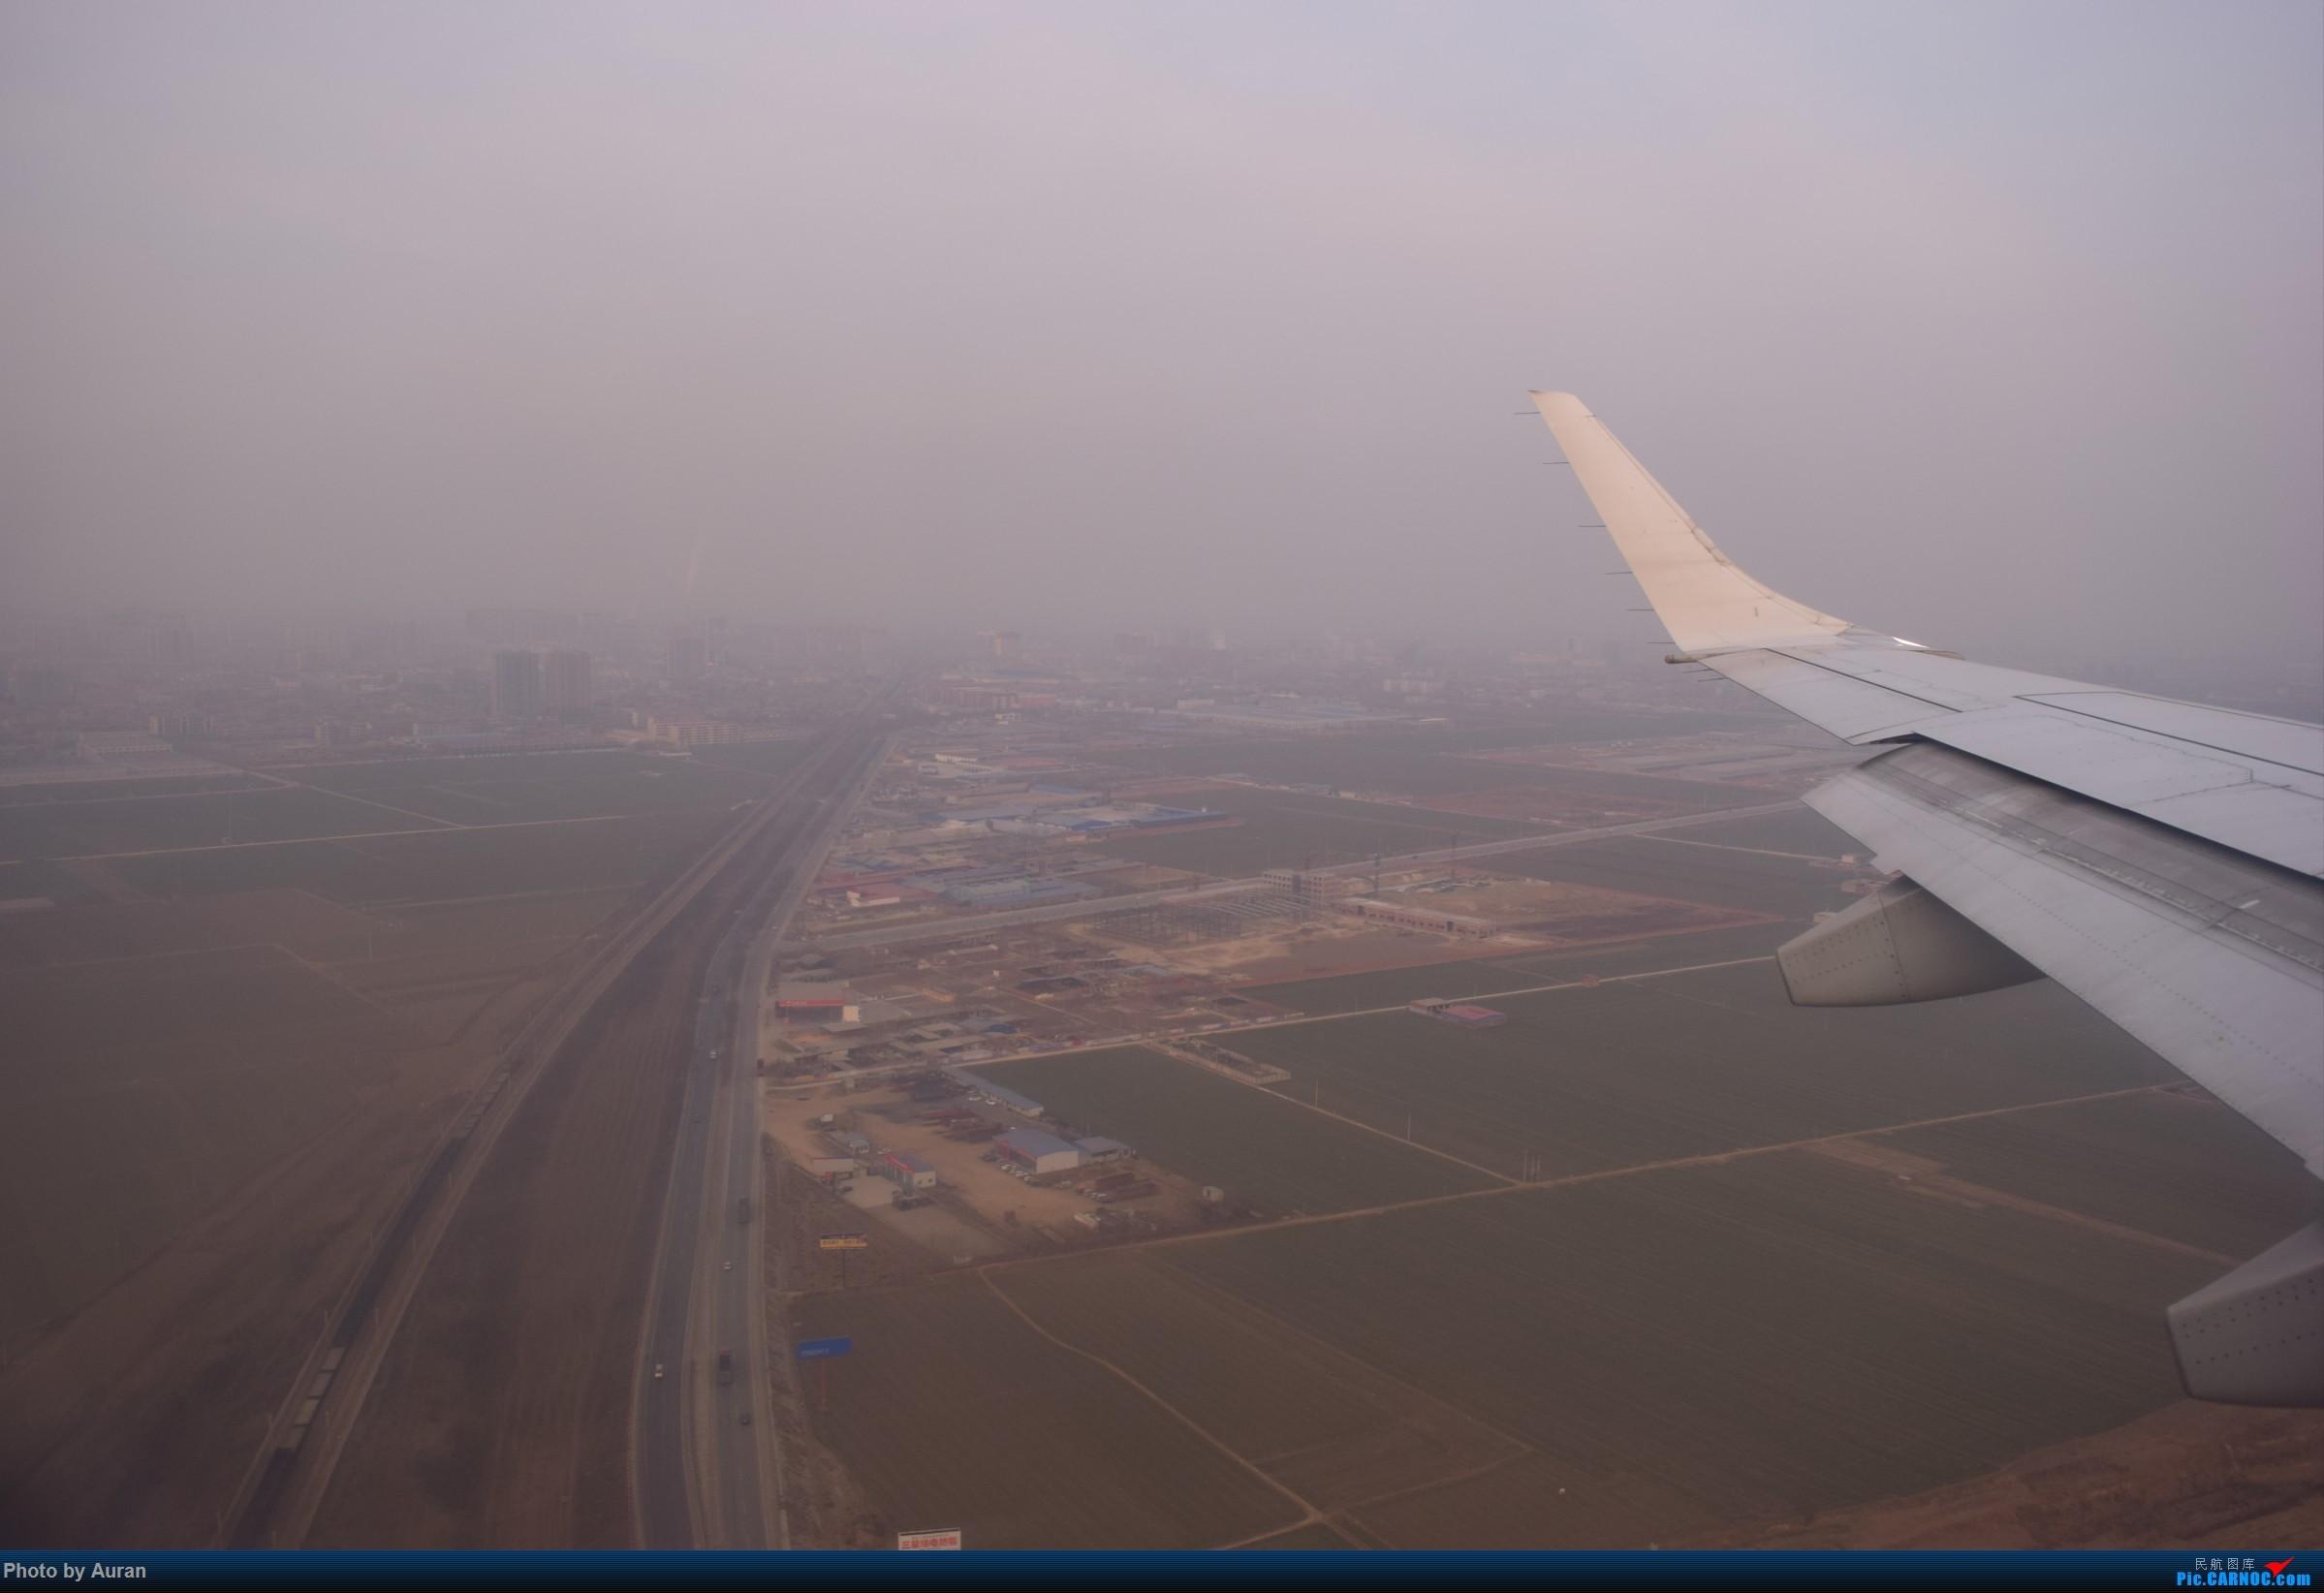 Re:【Auran游记2】陇秦之旅 E190 B-3207